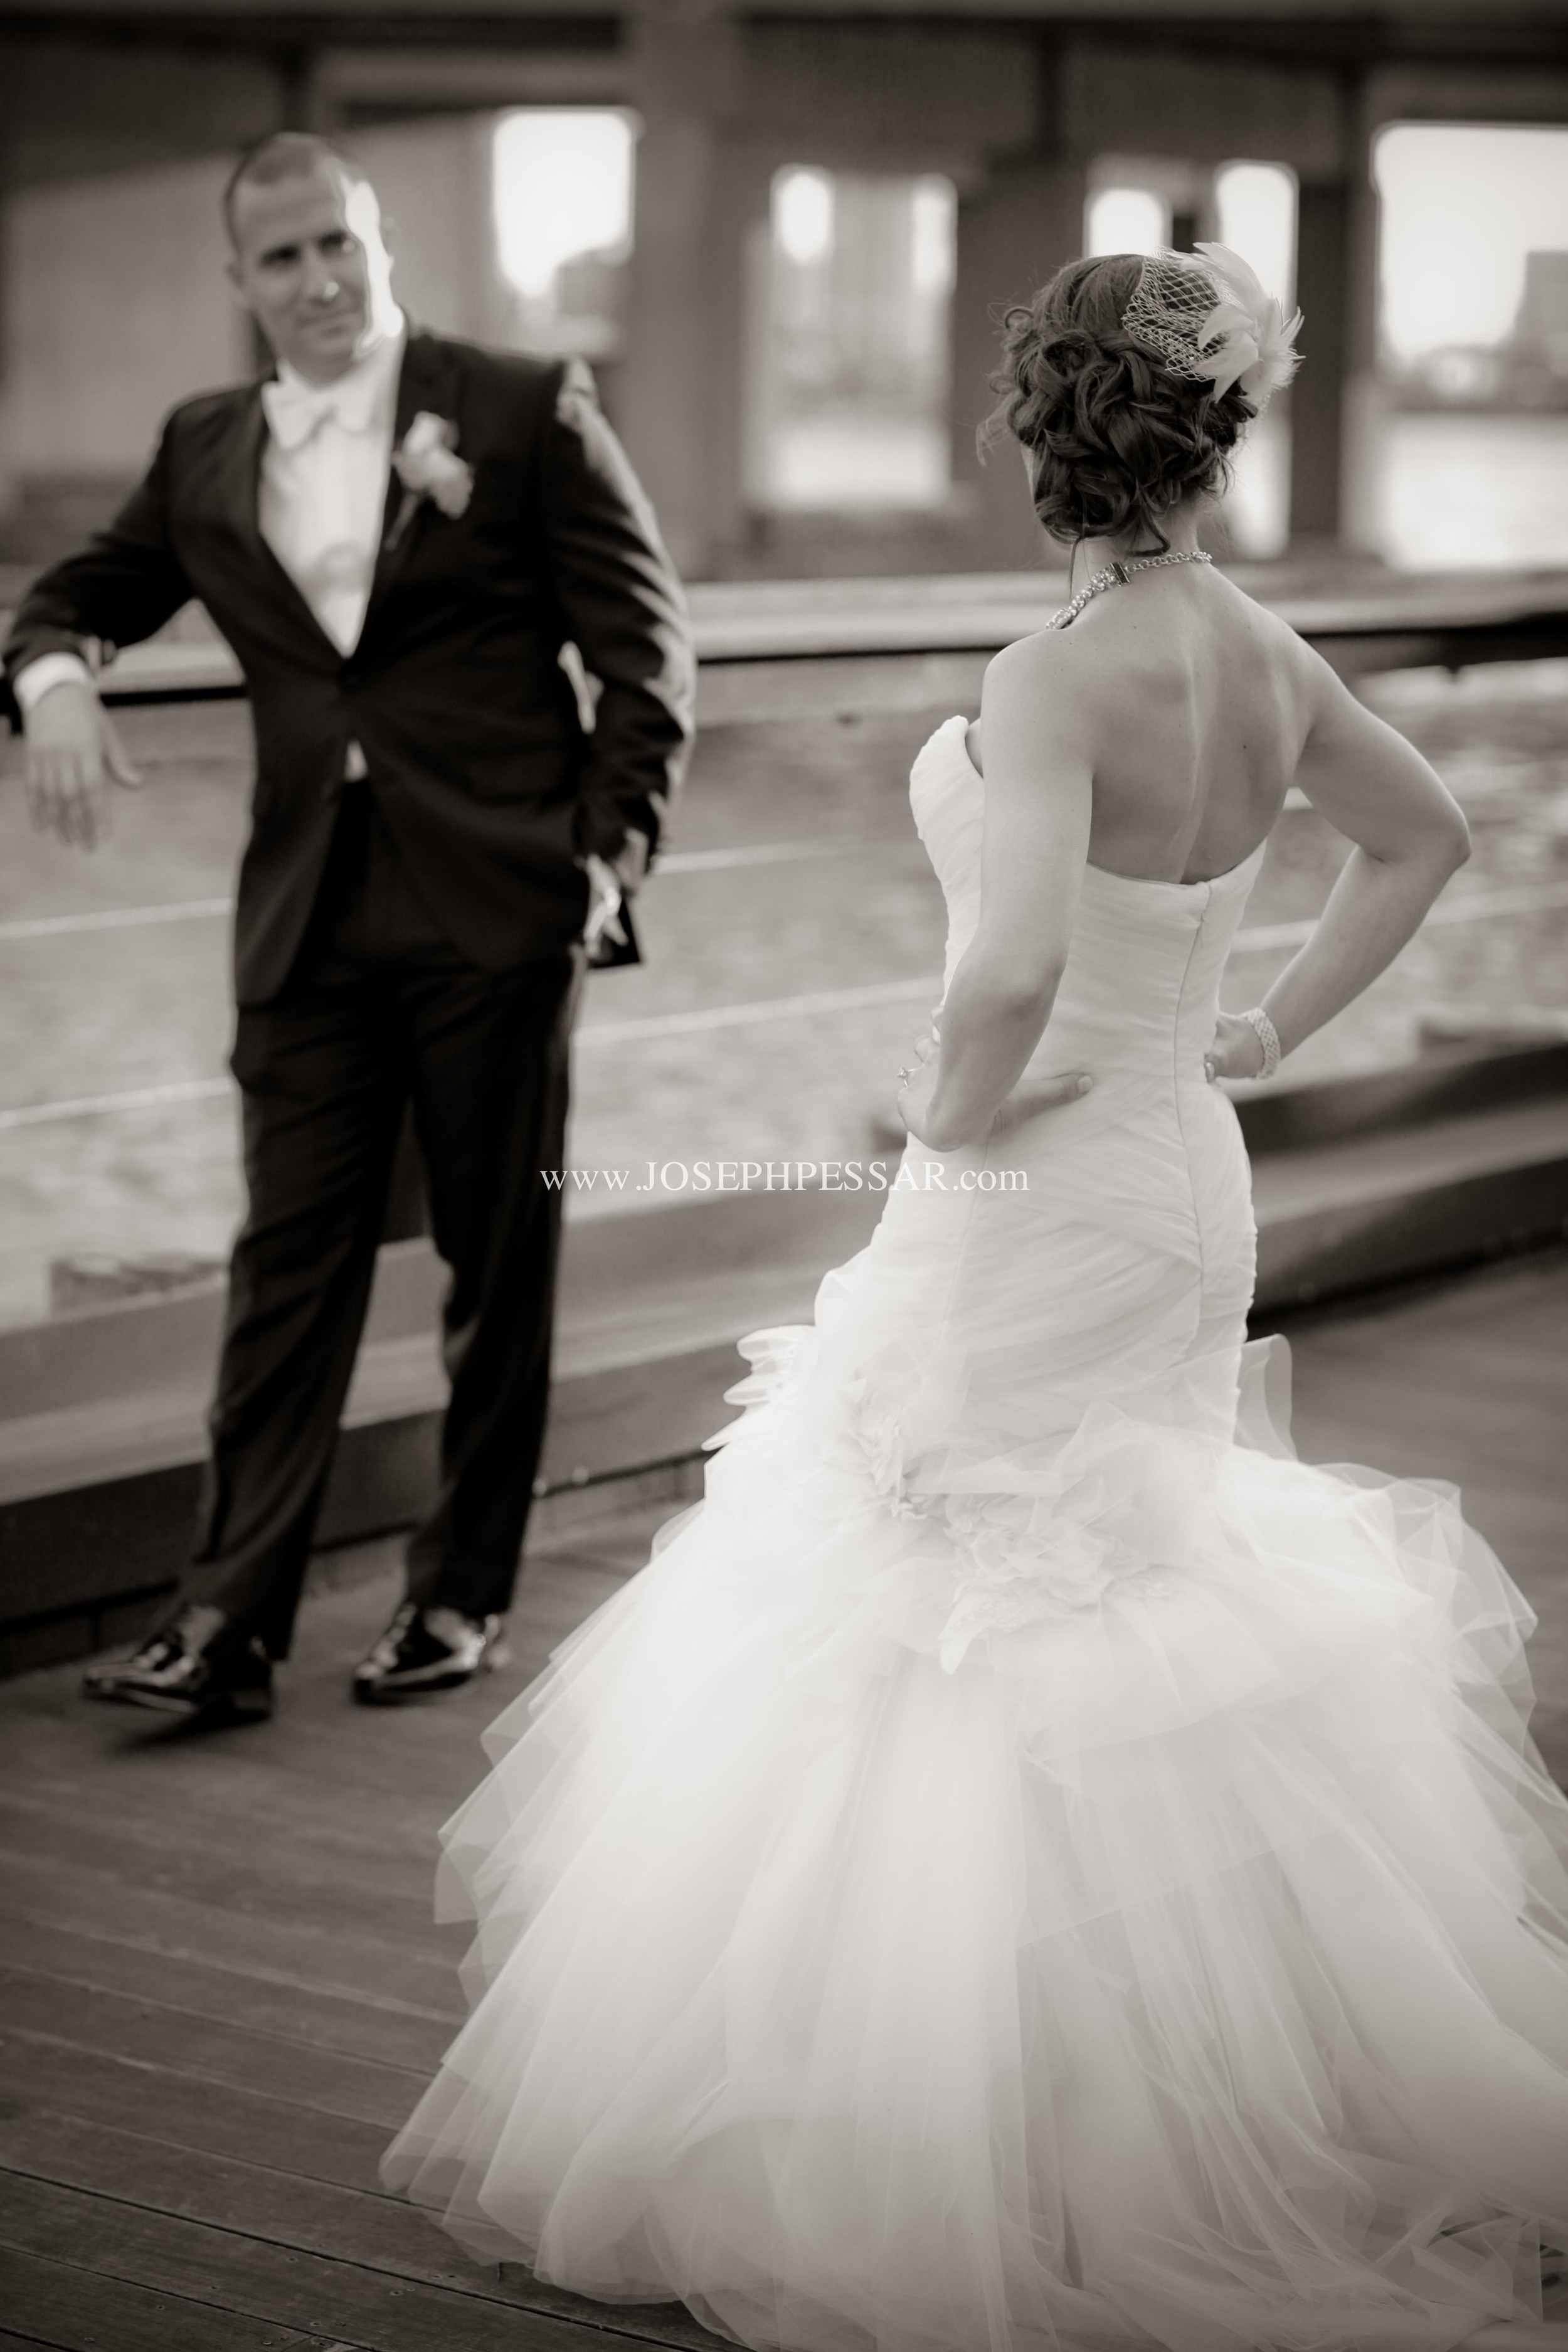 nyc_wedding_photographer0024.jpg